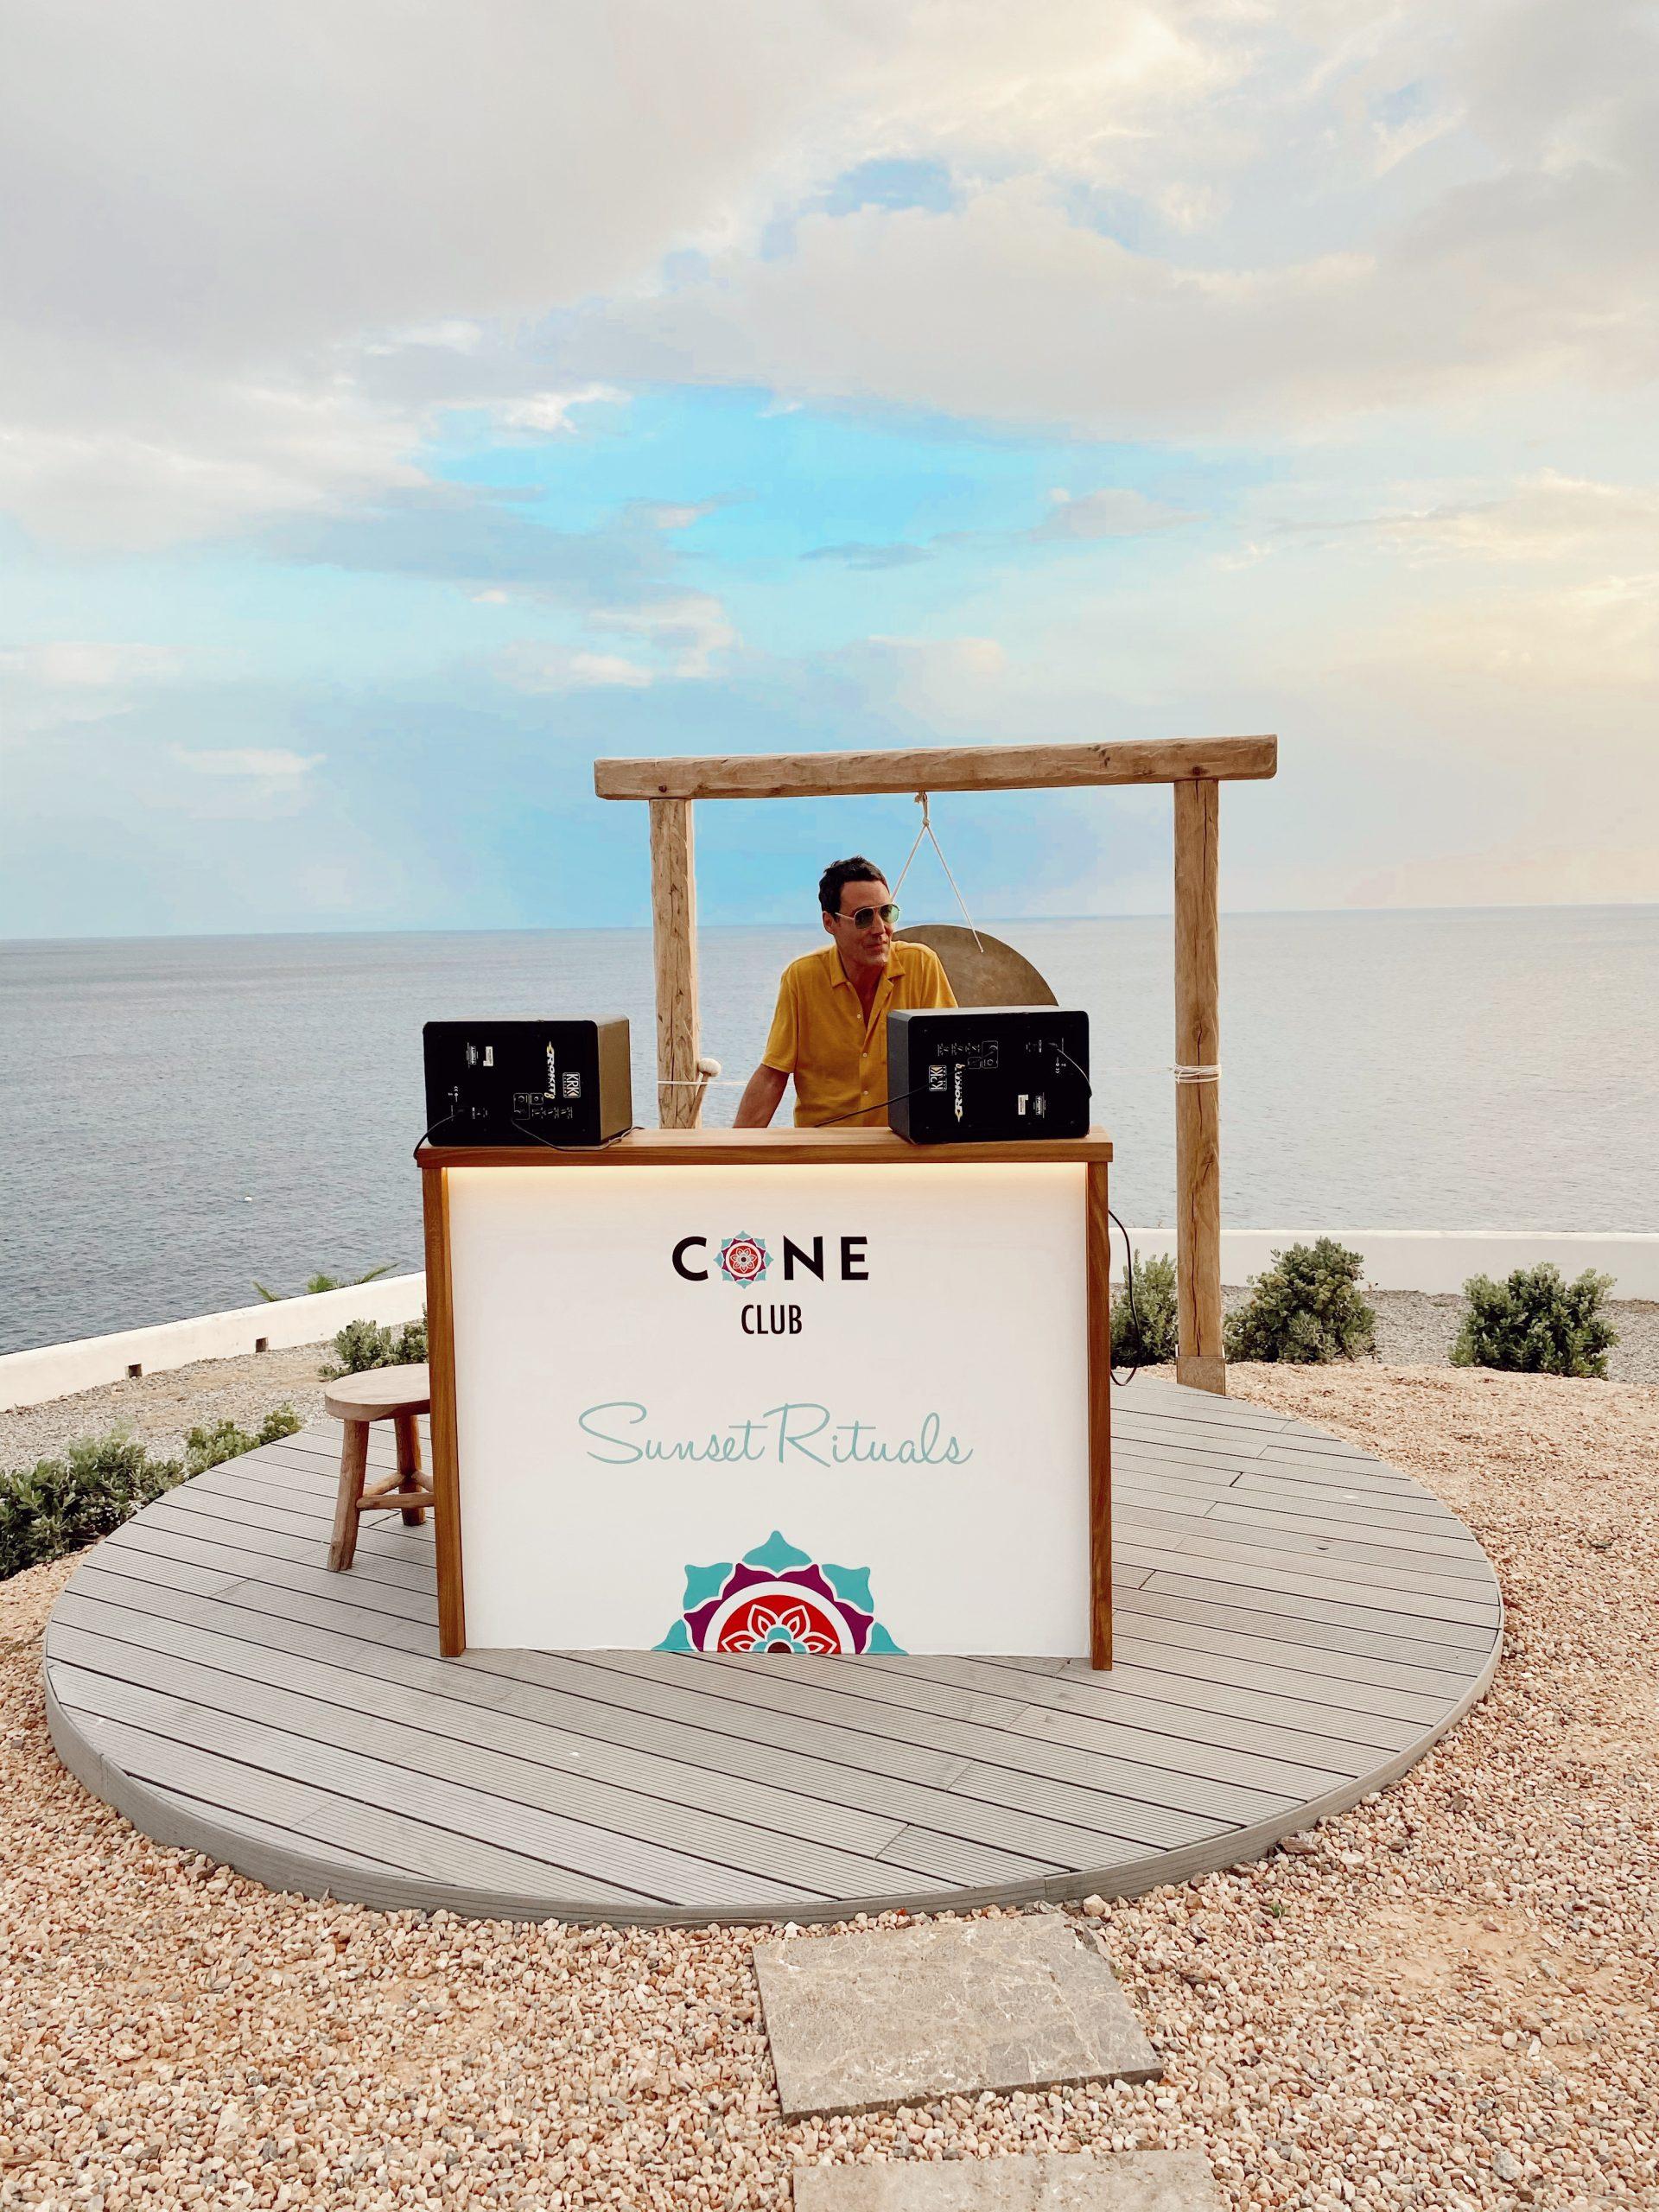 Cone Club Ibiza 2